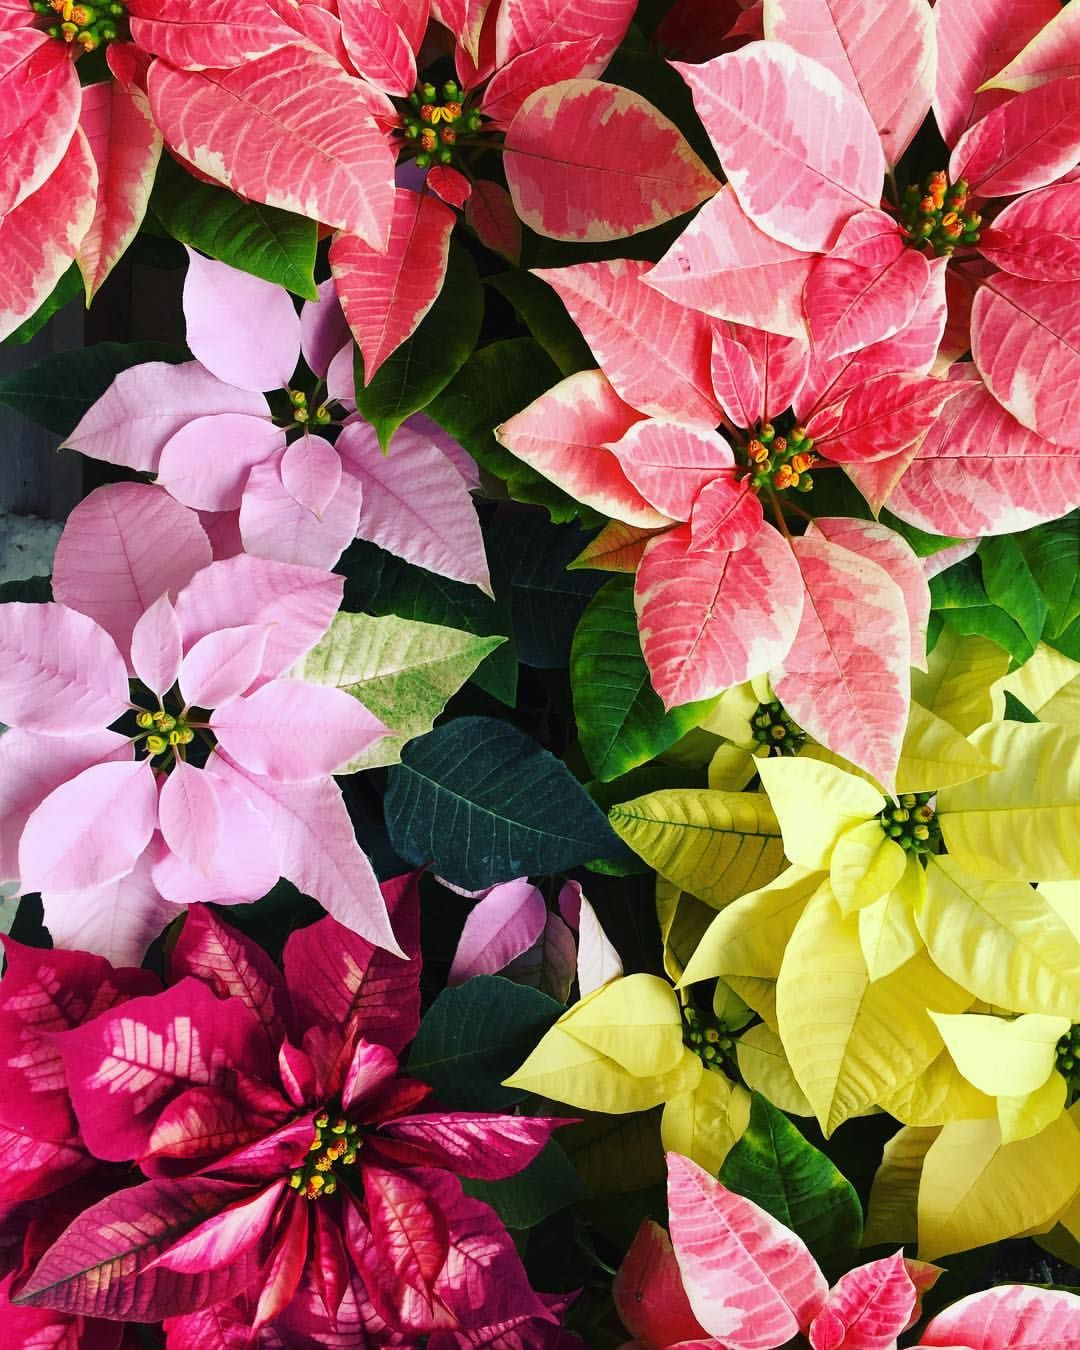 333 NOCHE BUENA nochebuena plants flowers nature